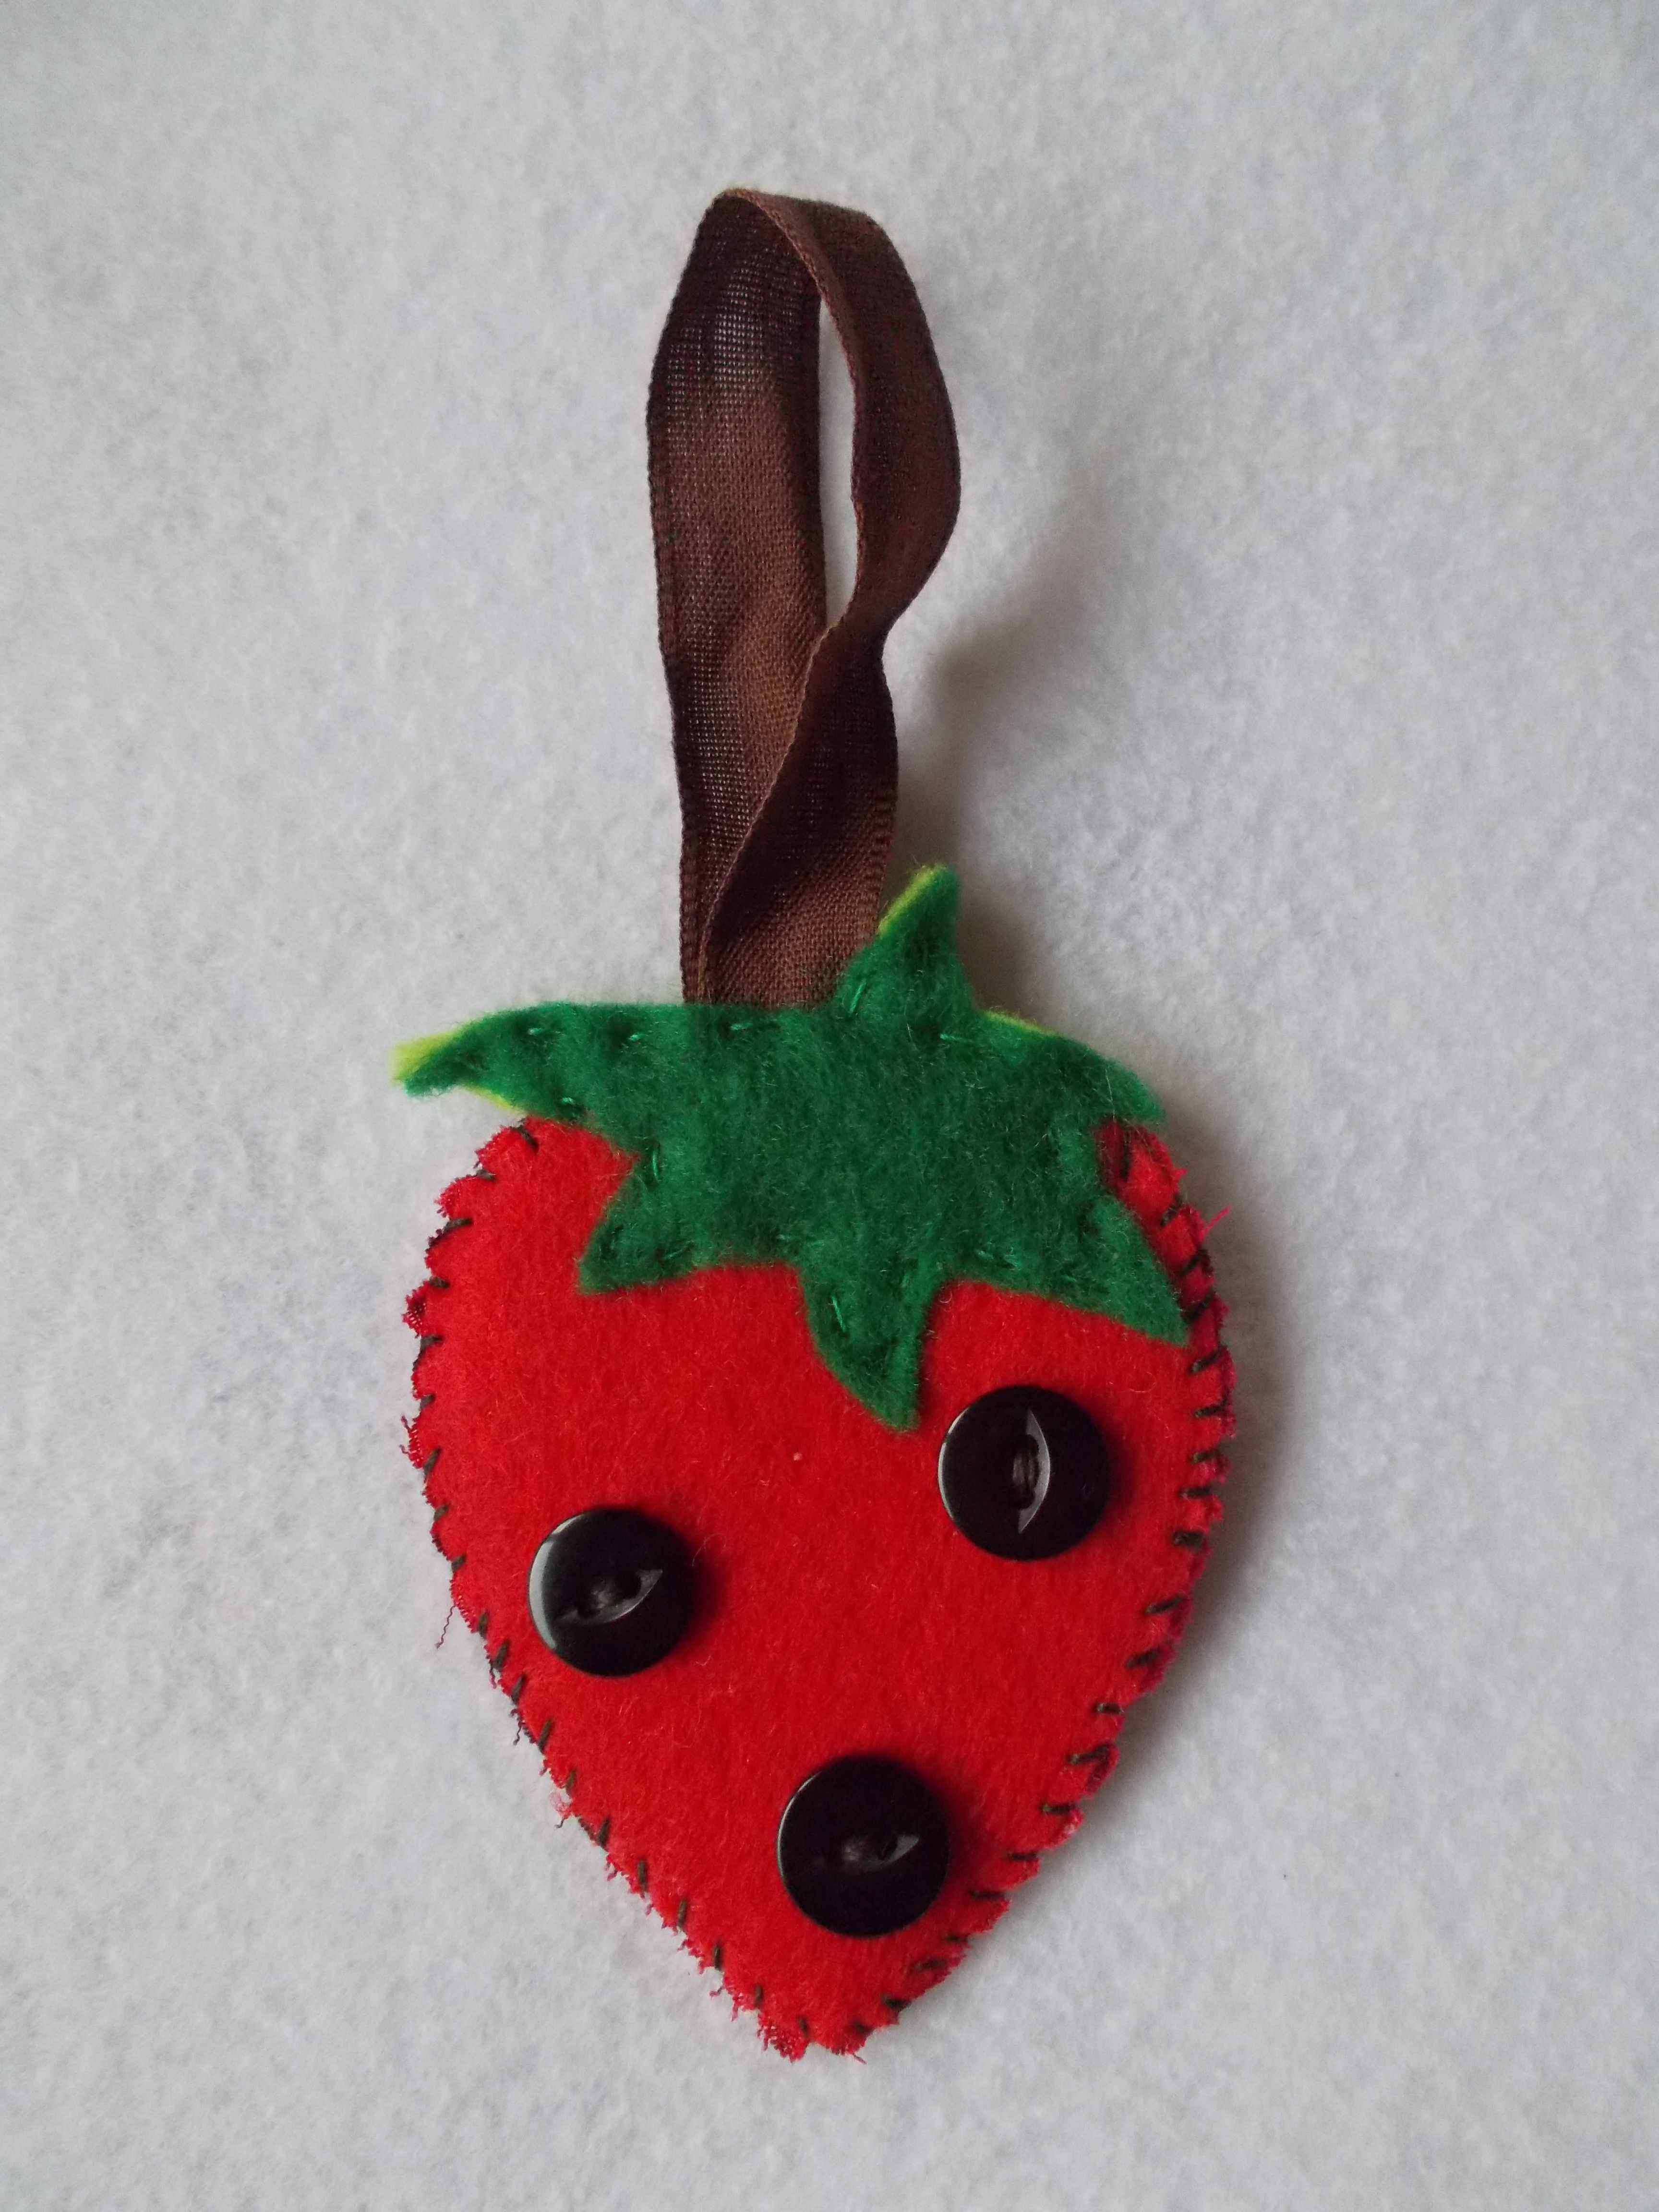 strawberry side 1